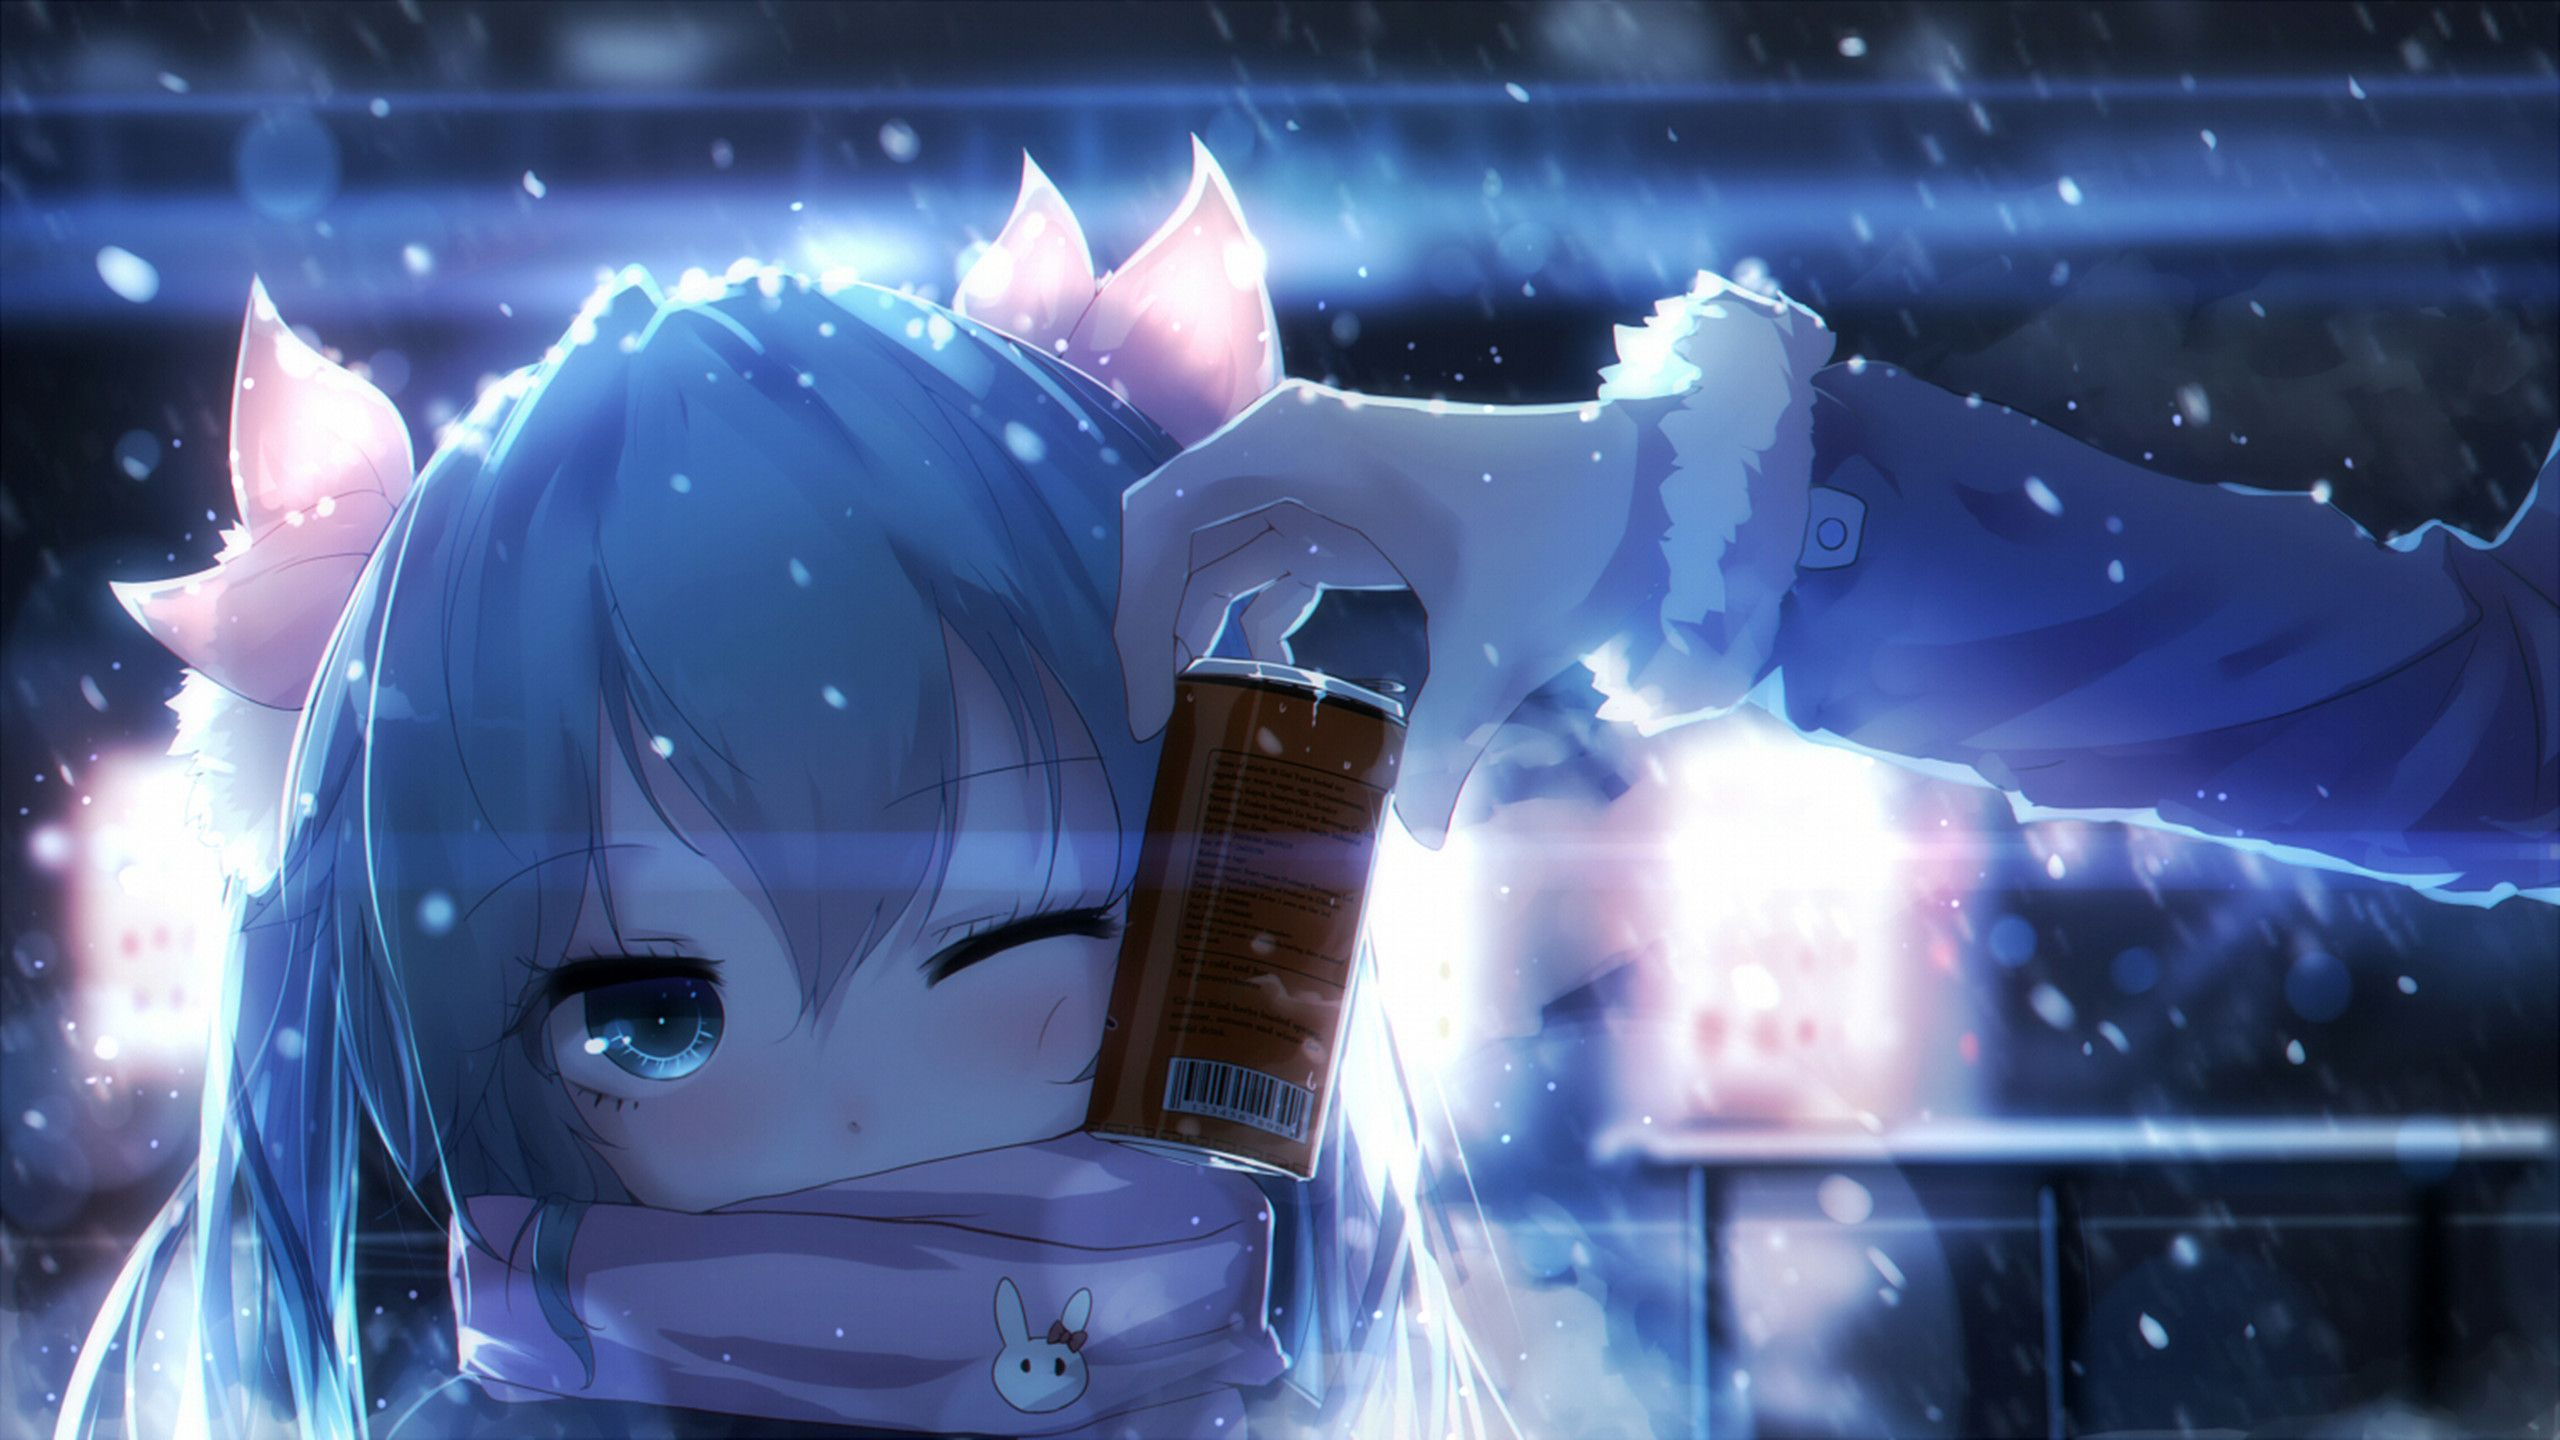 Anime Wallpaper 2560 X 1440 Hatsune Miku Snow Cold Blue Scarf